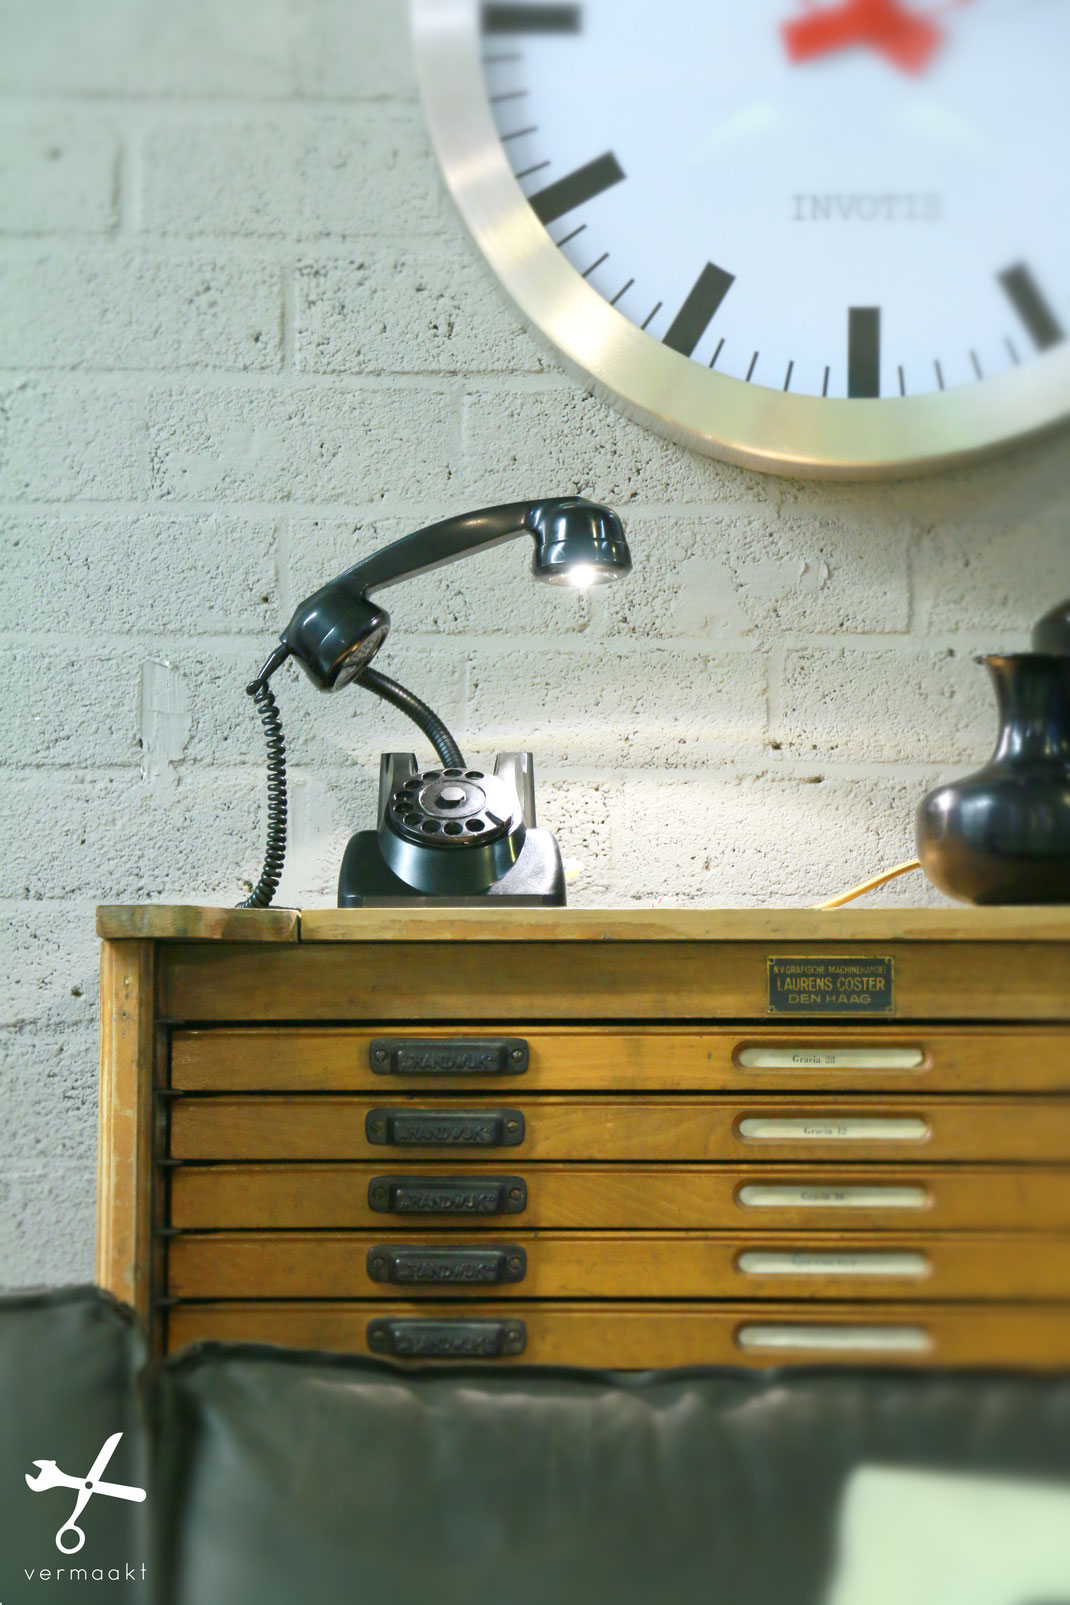 vermaakt telefoonlamp by luc wermers